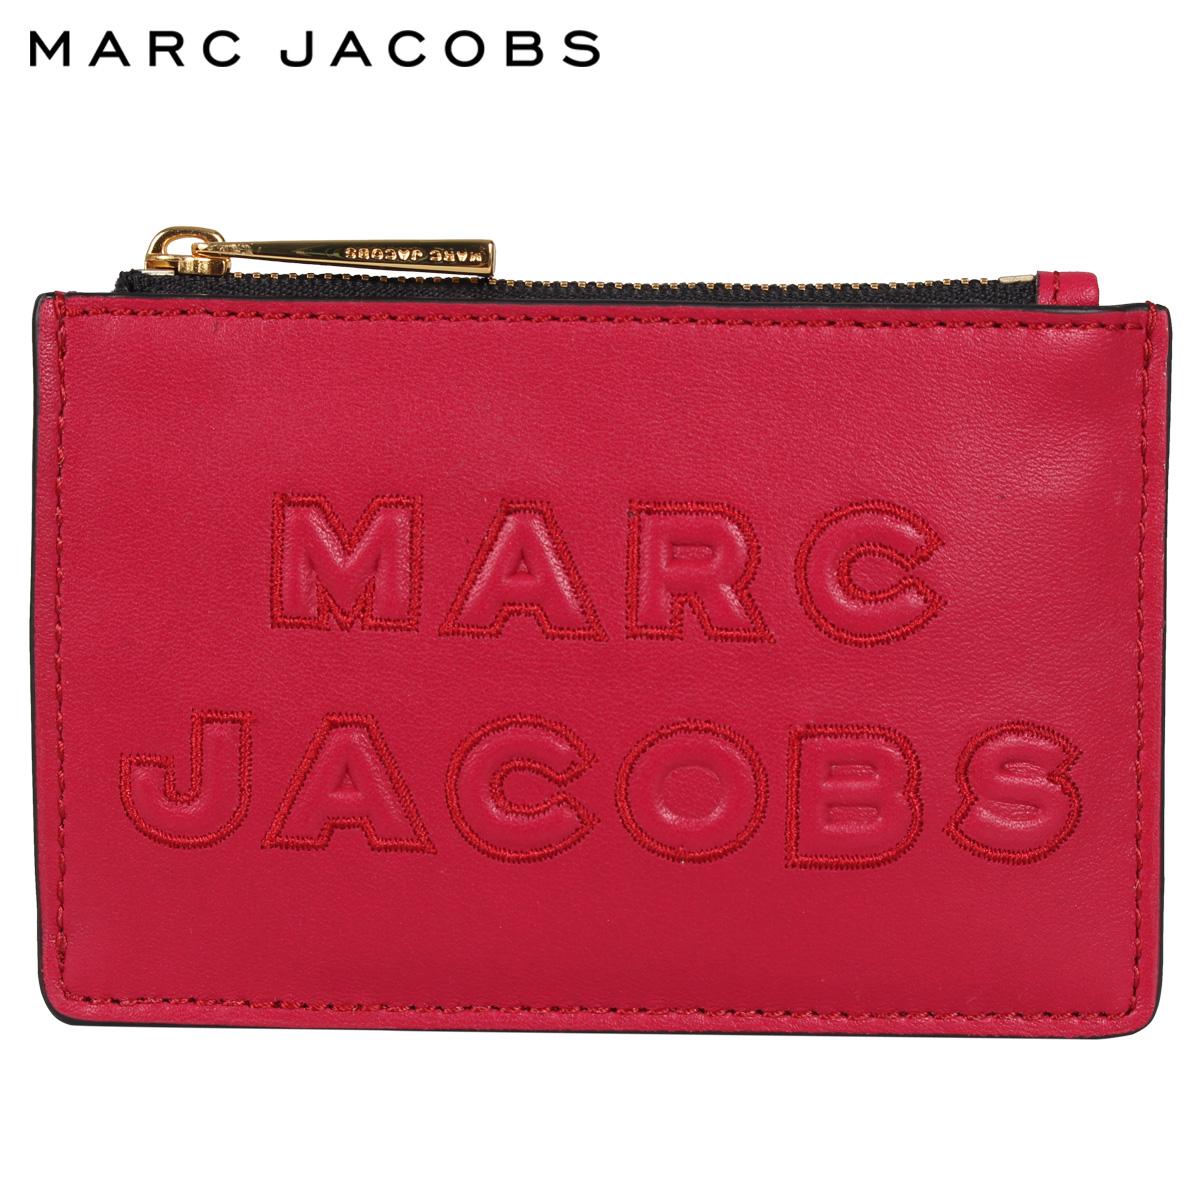 MARC JACOBS マークジェイコブス パスケース カードケース ID 定期入れ 小銭入れ キーケース レディース CARD CASE レッド M0015753-616 [4/27 新入荷]